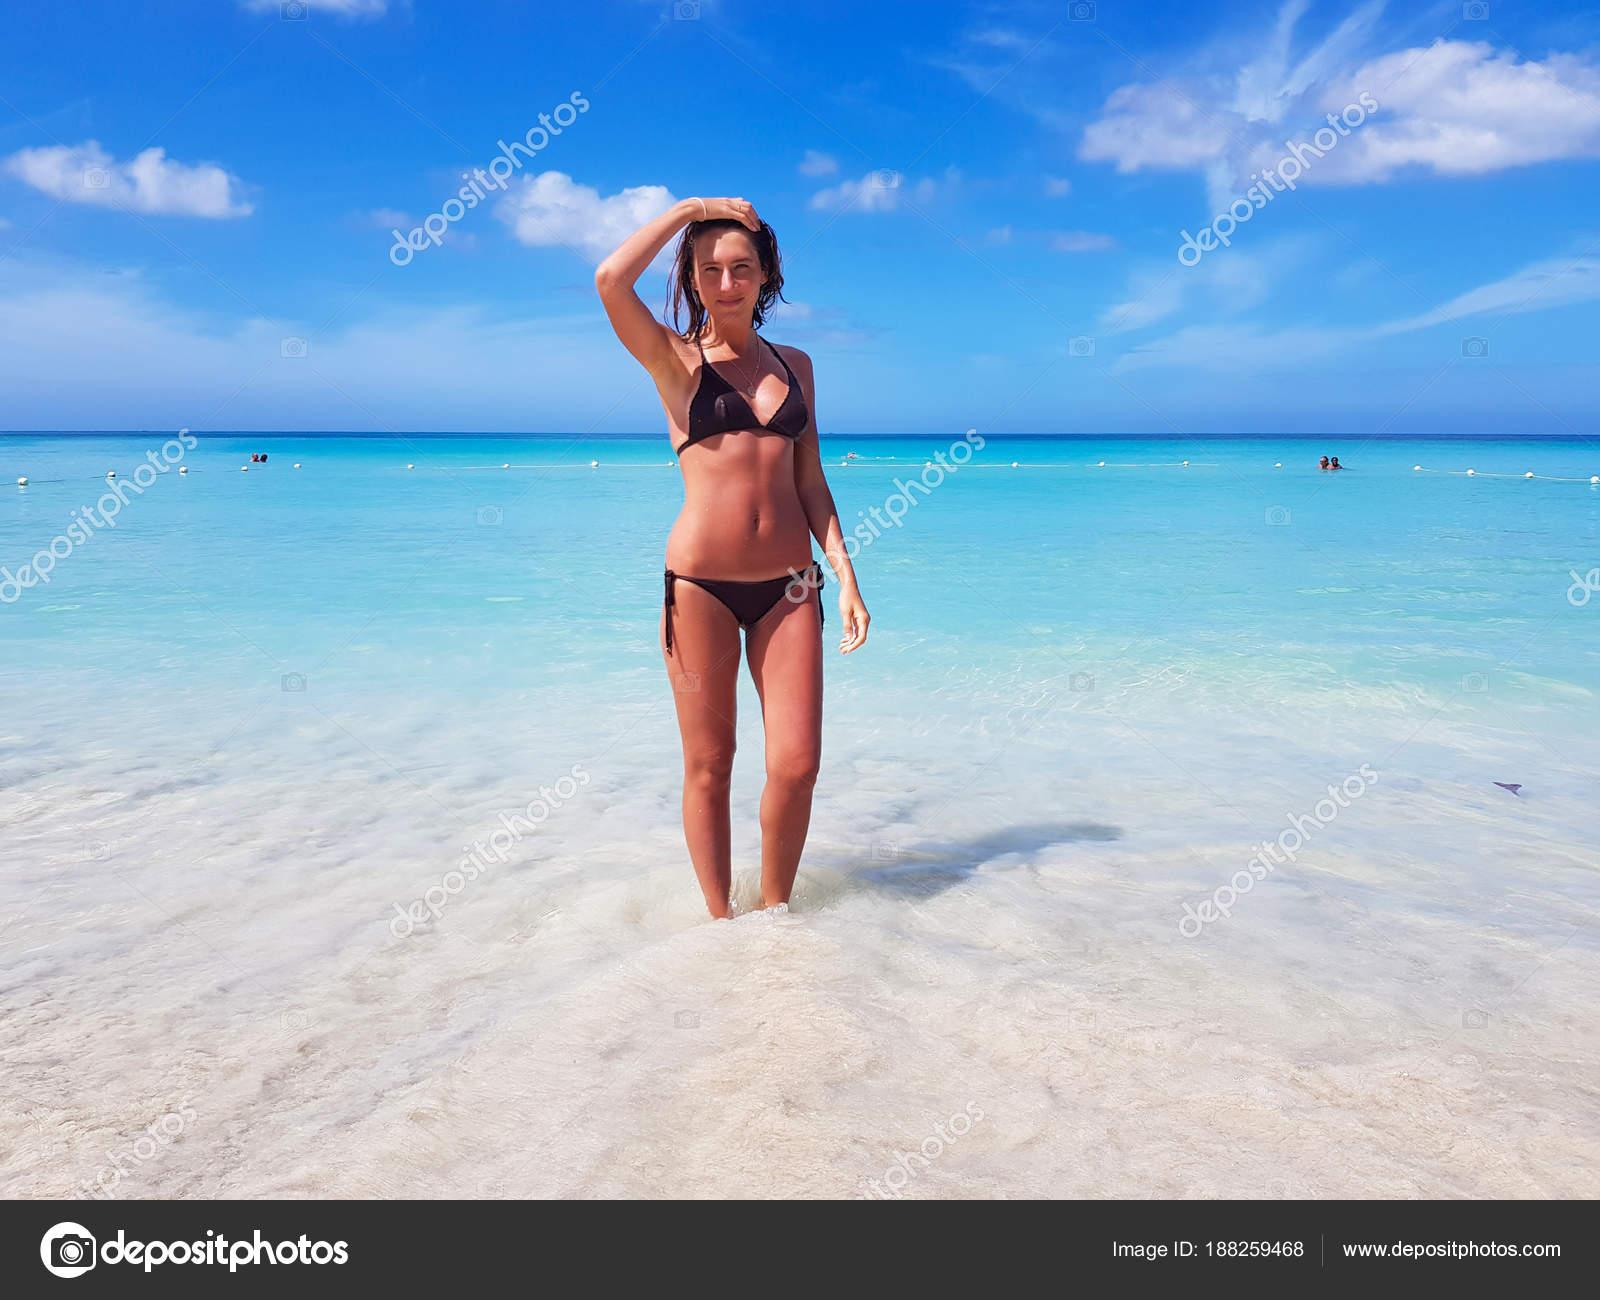 Bikini Jamaica Playa Caribe Mar Lugares Chica Pintoresco lK1FJc